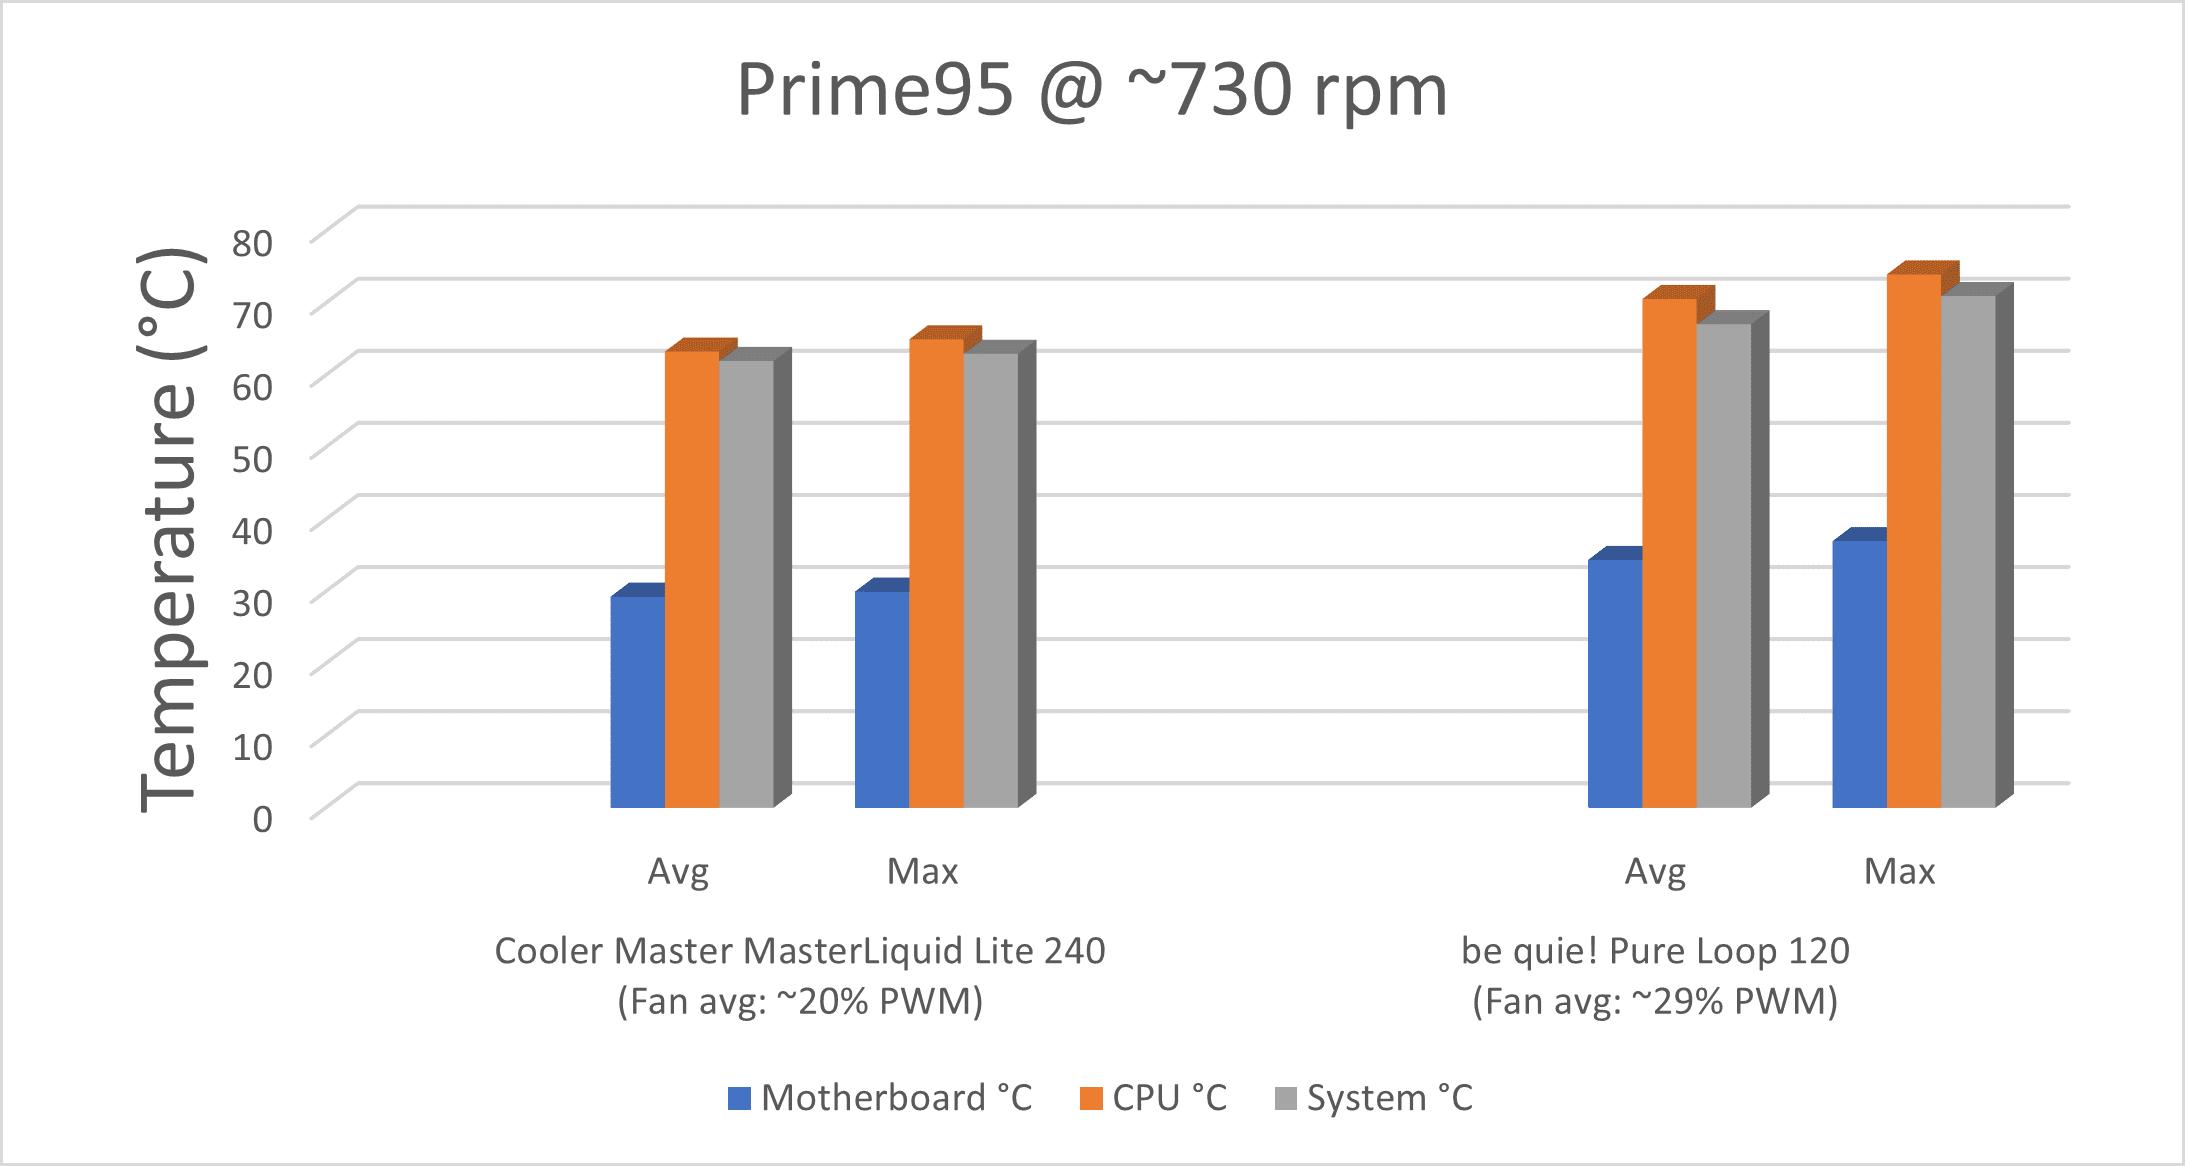 Prime95_730rpm.png